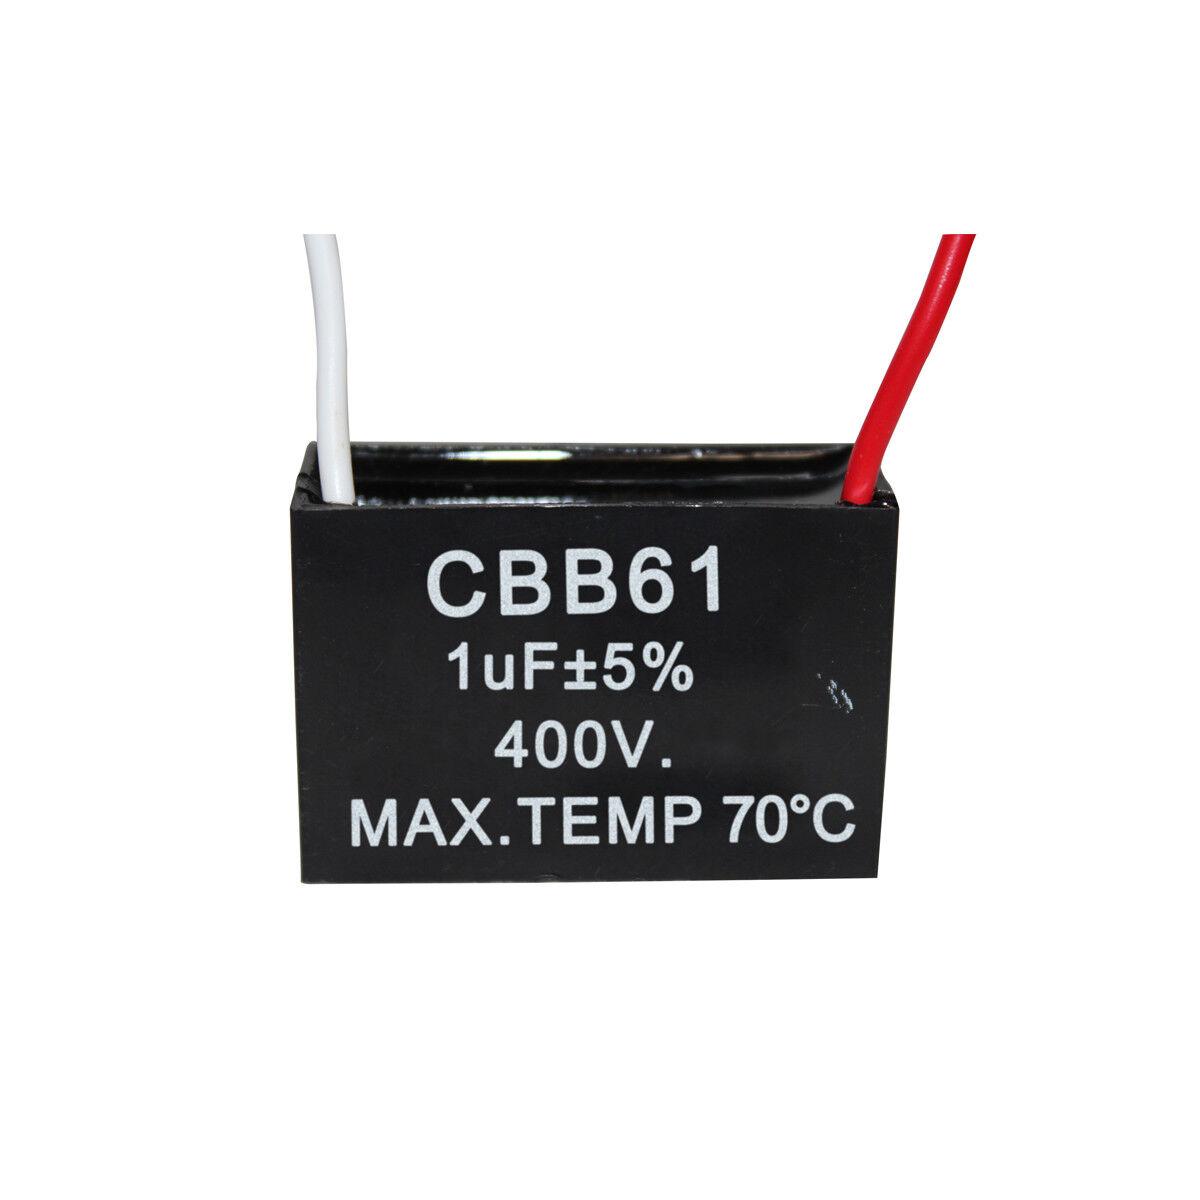 2PCS CBB61 Terminal Ceiling Fan Motor Running Rectangle Capacitor 400V 1UF